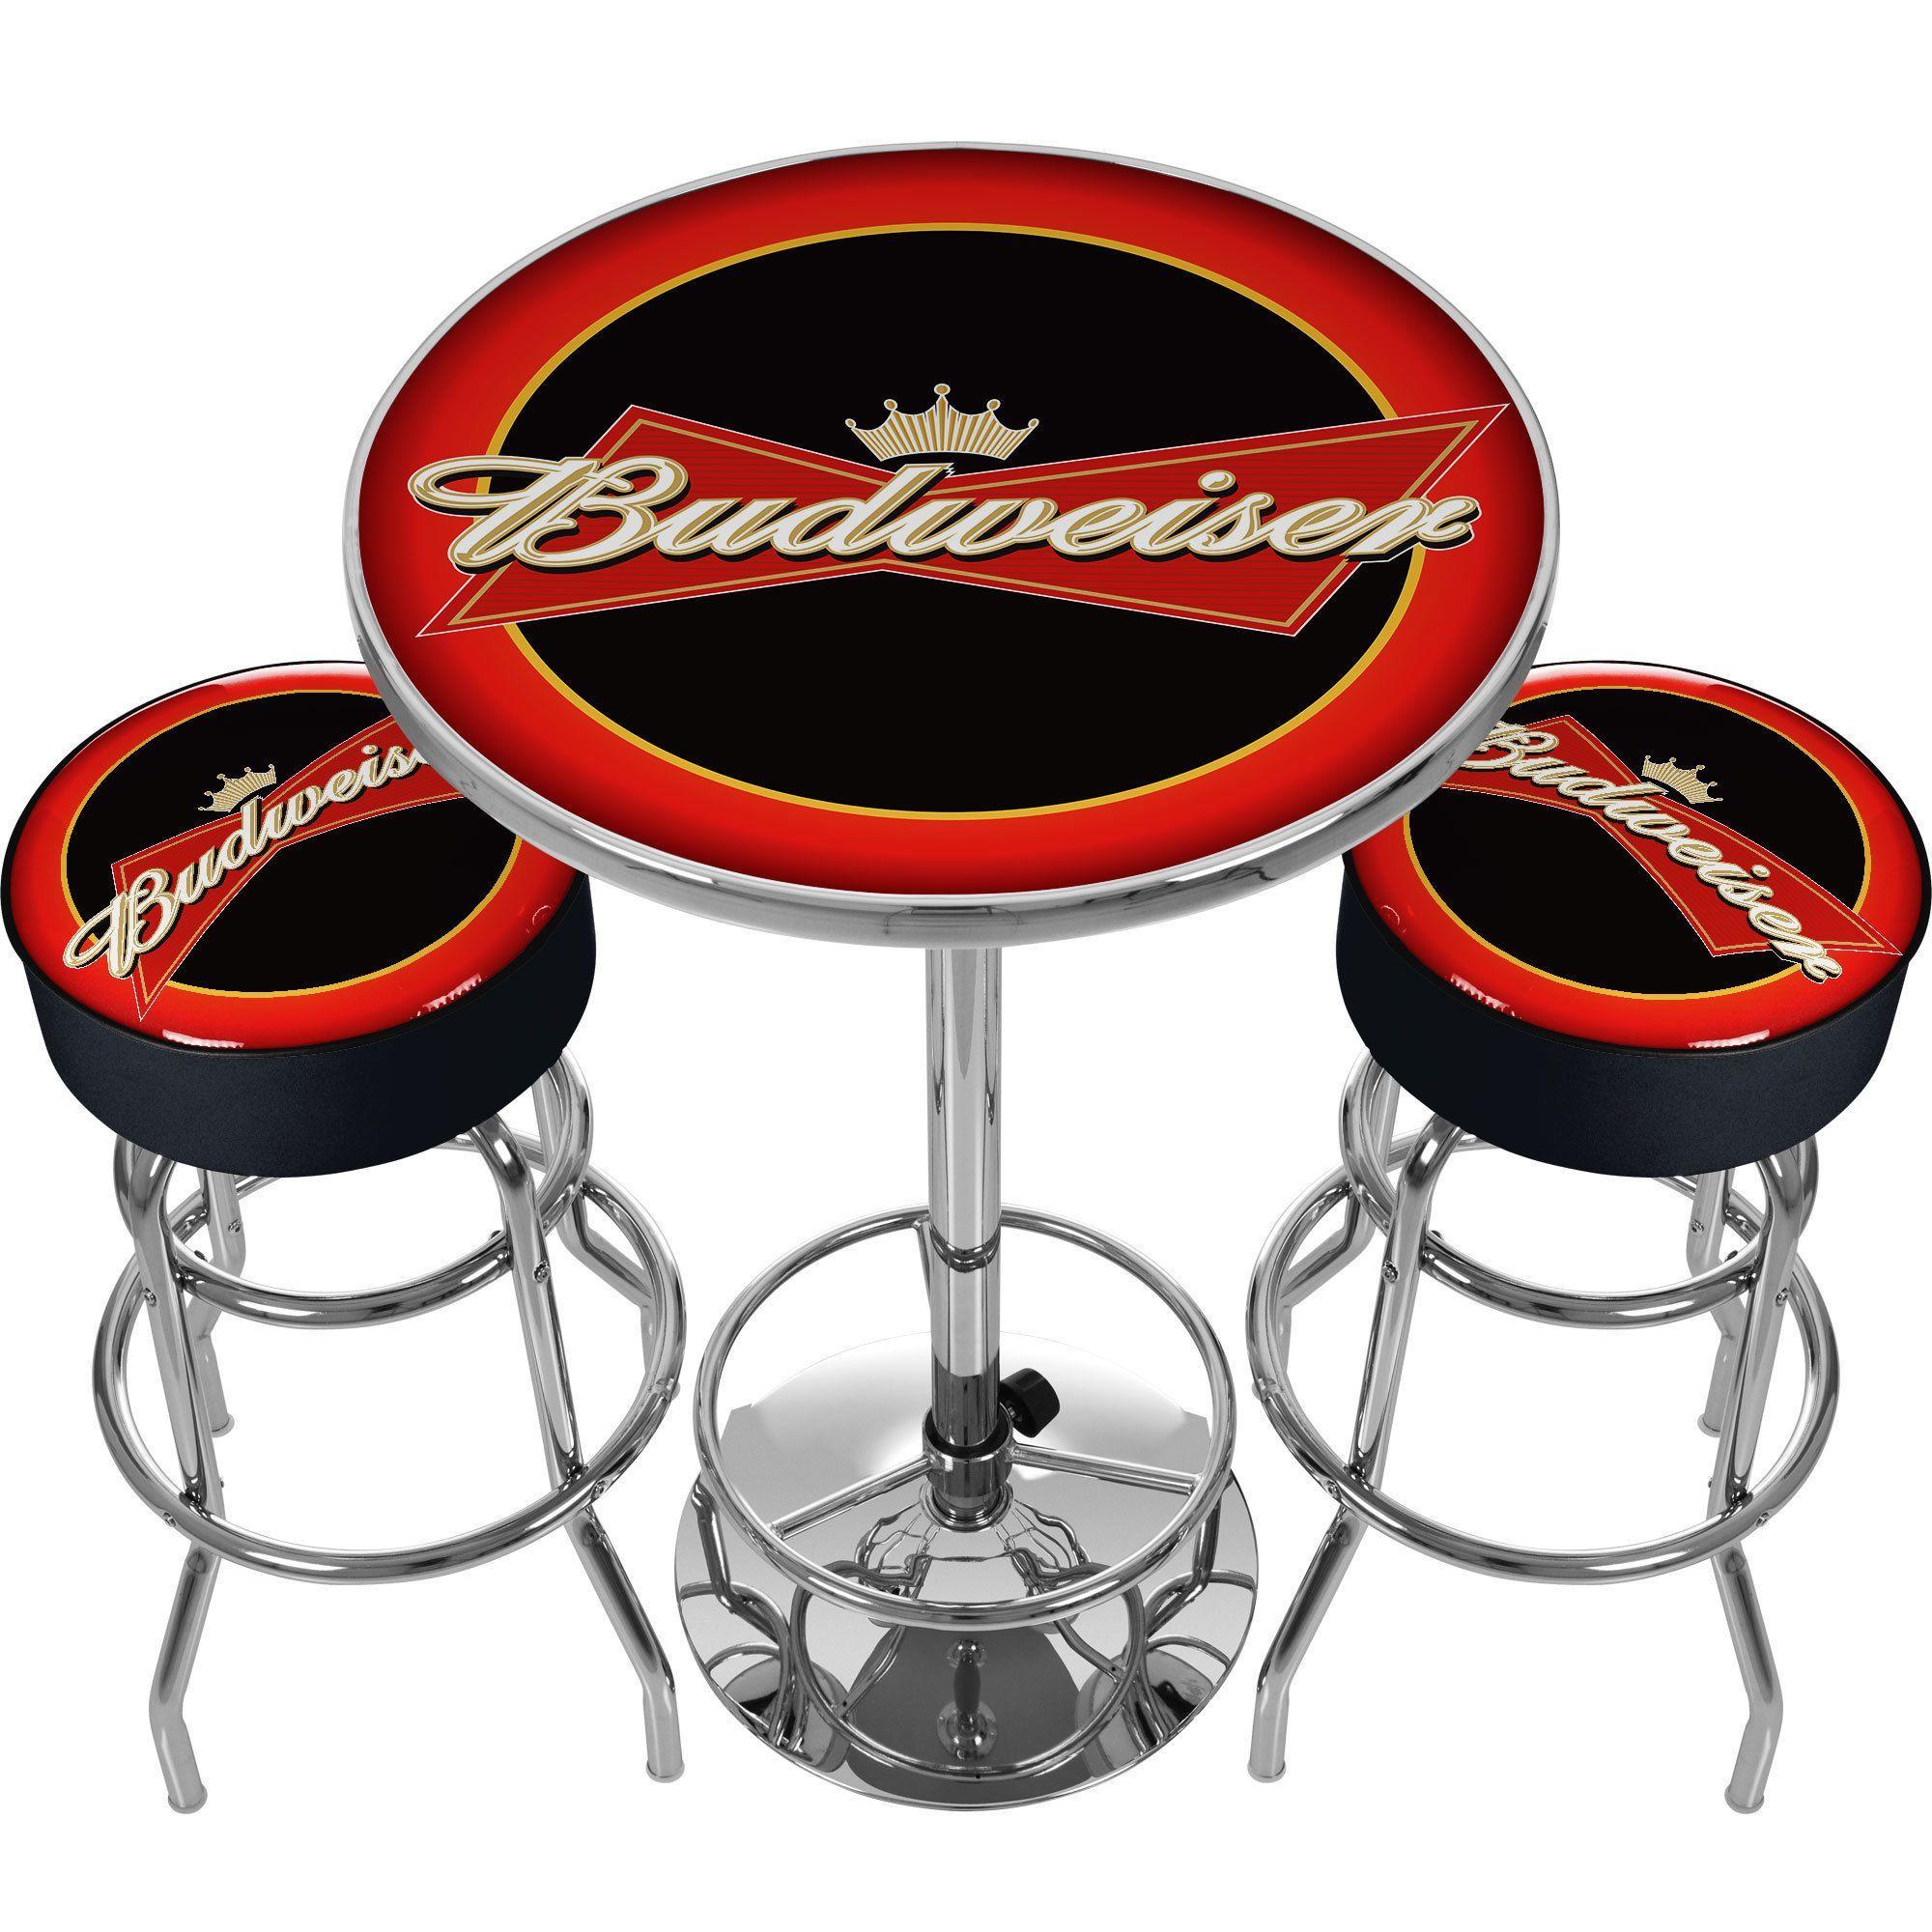 Ultimate budweiser gameroom combo 2 bar stools and table ultimate budweiser gameroom combo 2 bar stools and table watchthetrailerfo